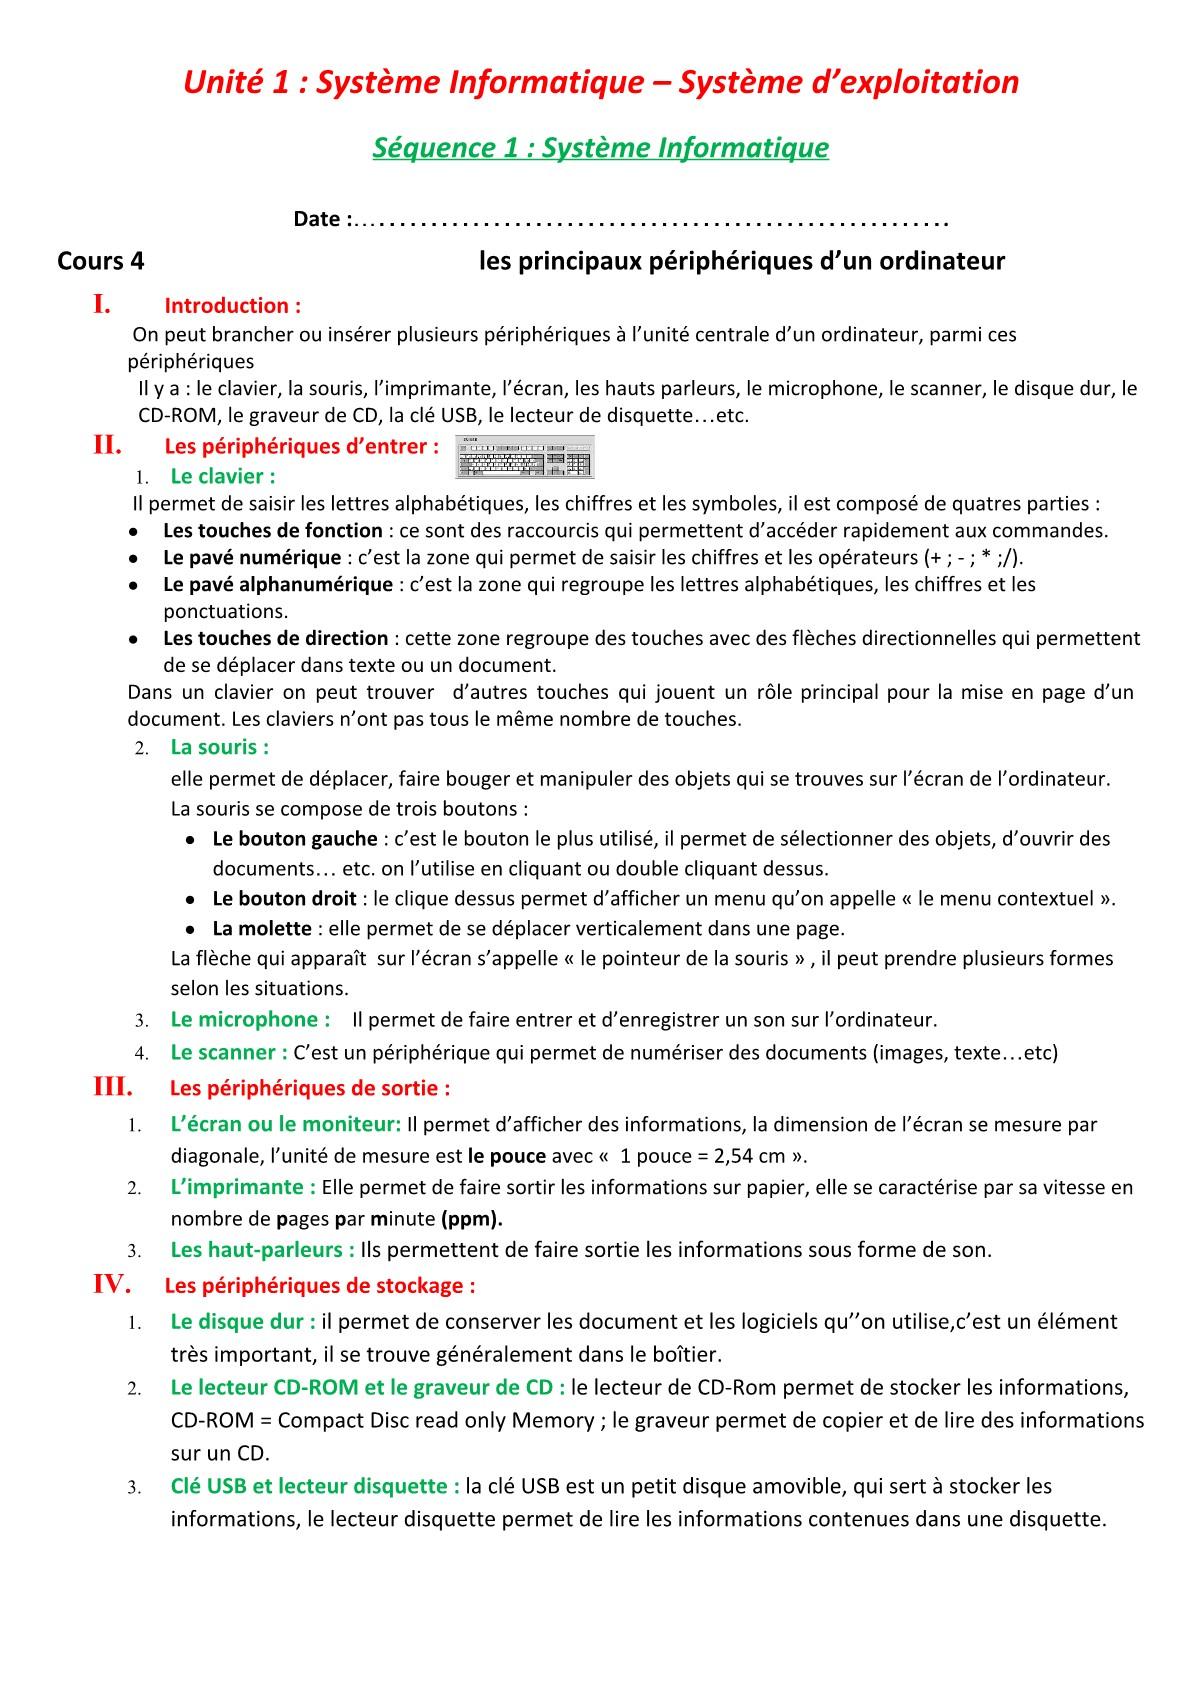 درس Les principaux périphériques d'un ordinateur للسنة الأولى اعدادي